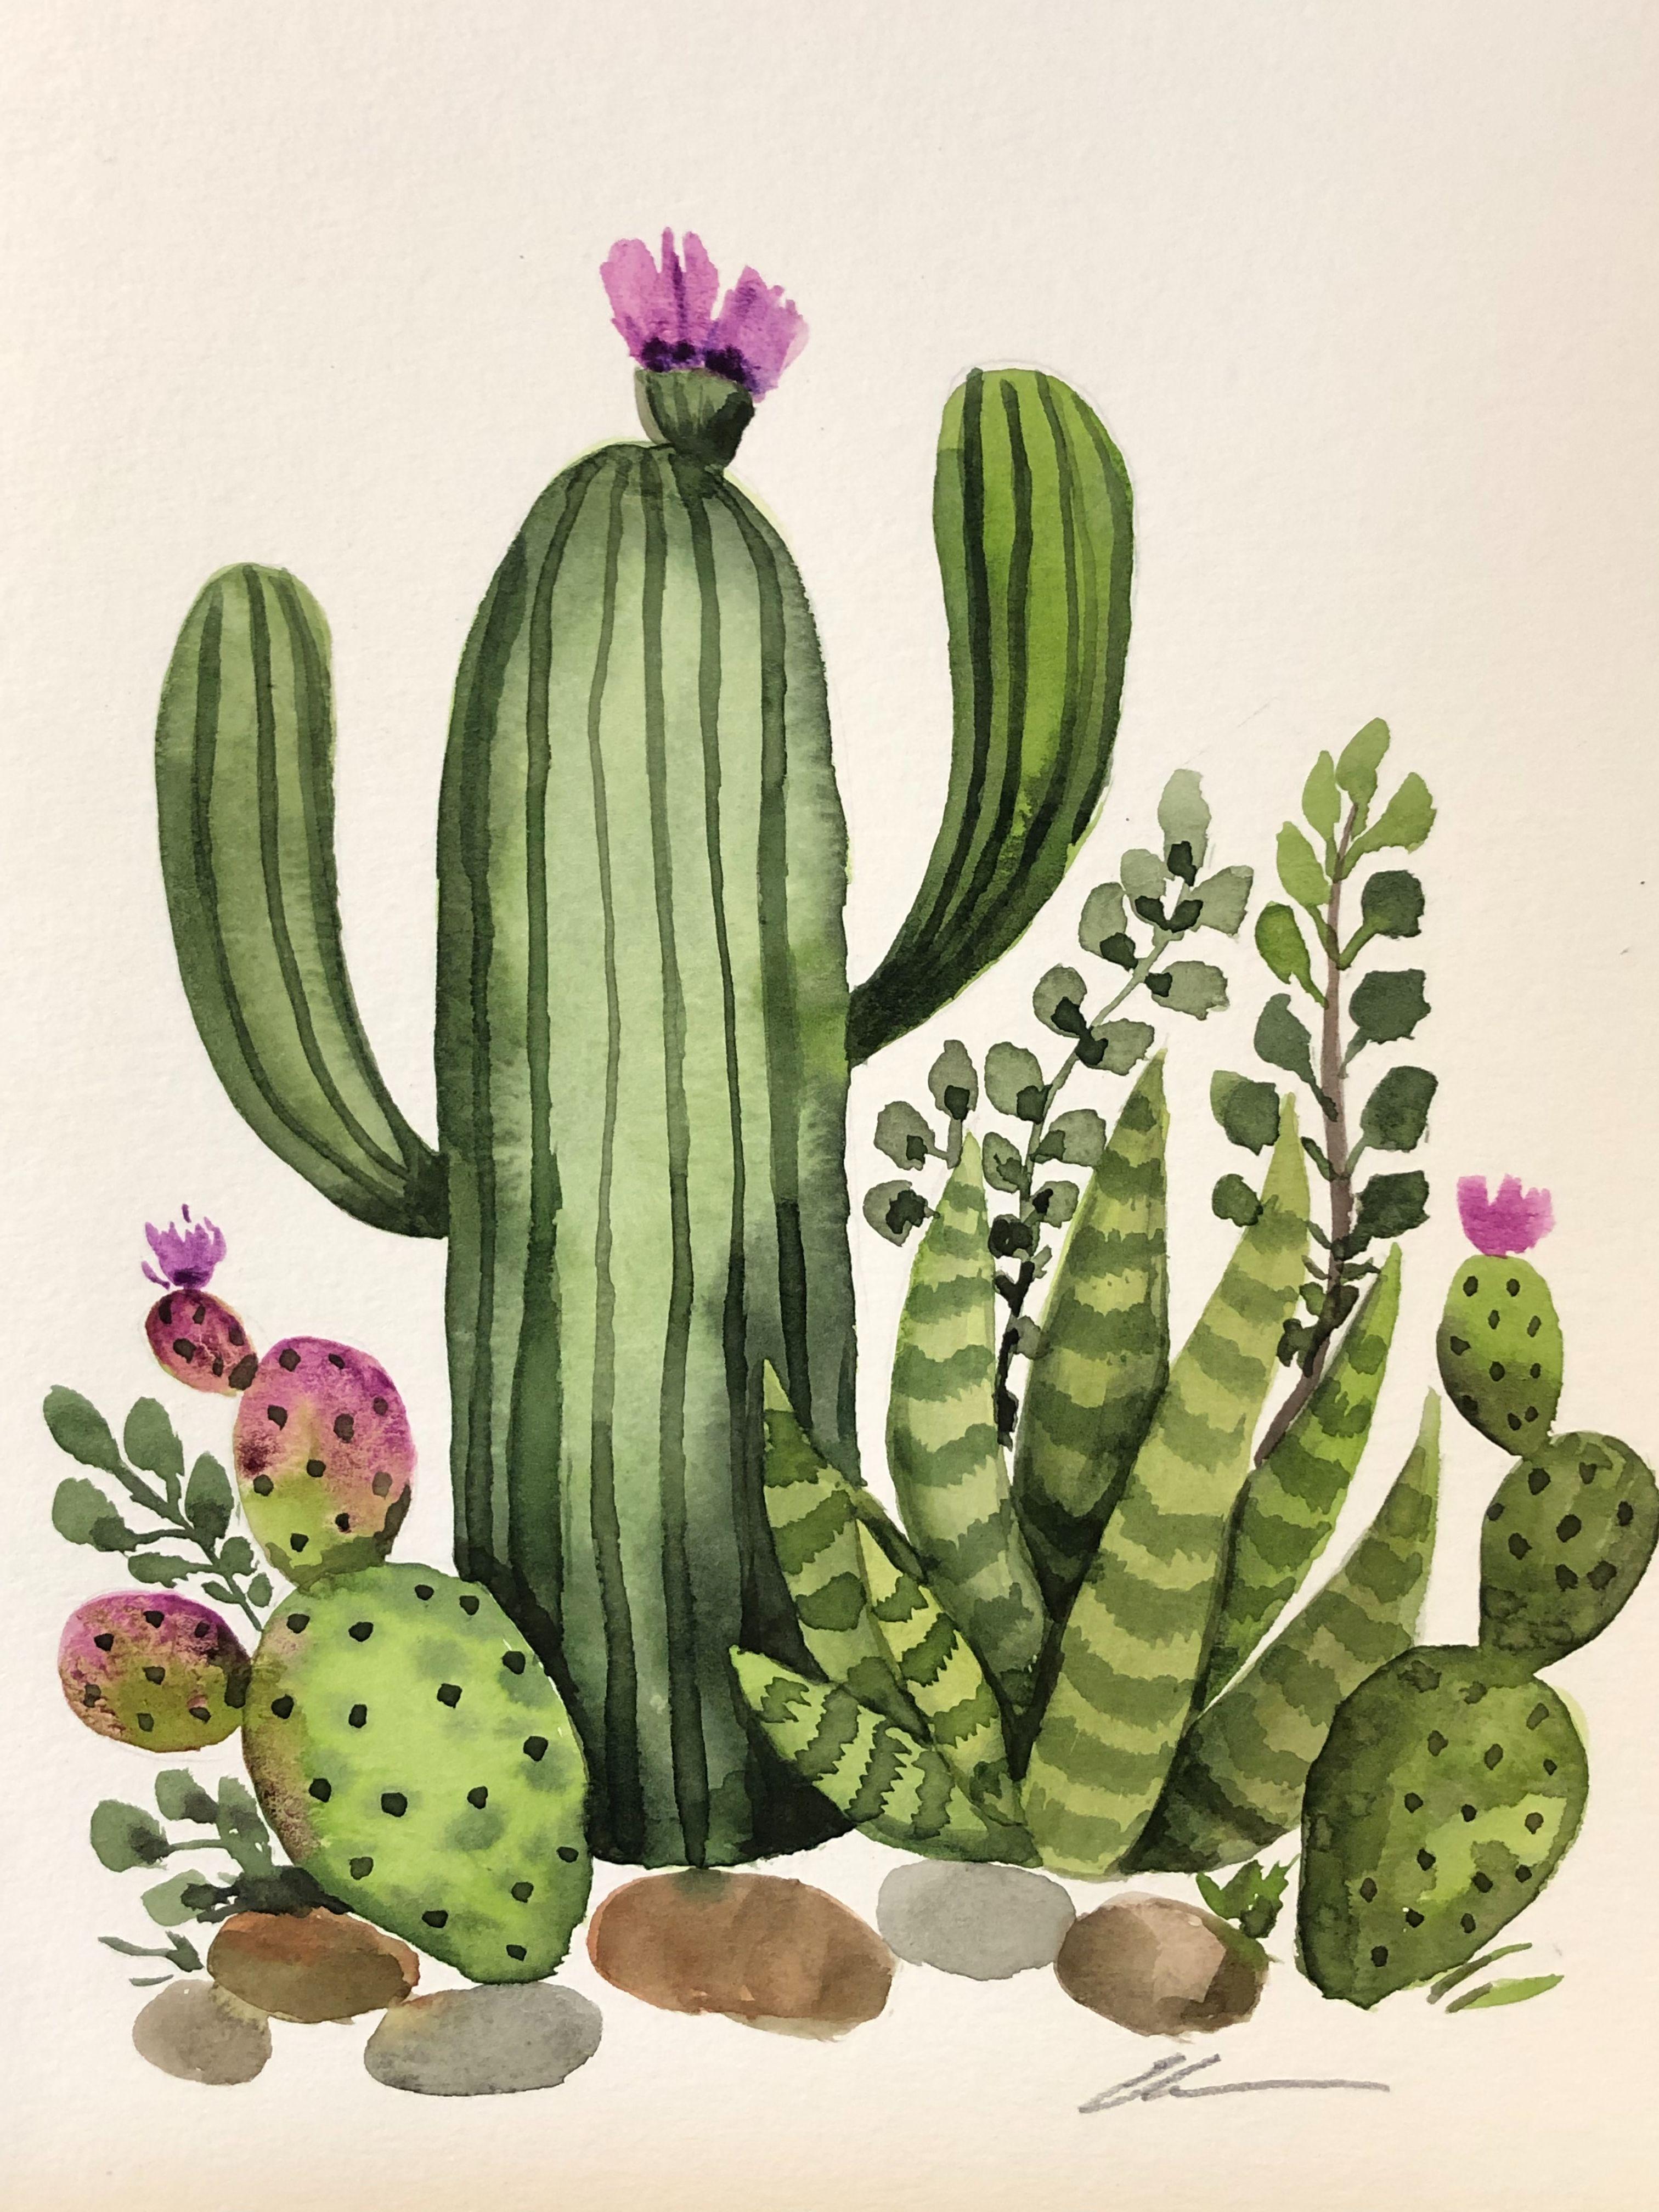 Cactus Garden Original Watercolor Painting Pintura De Cactus Flores Pintadas Fotos De Cactus